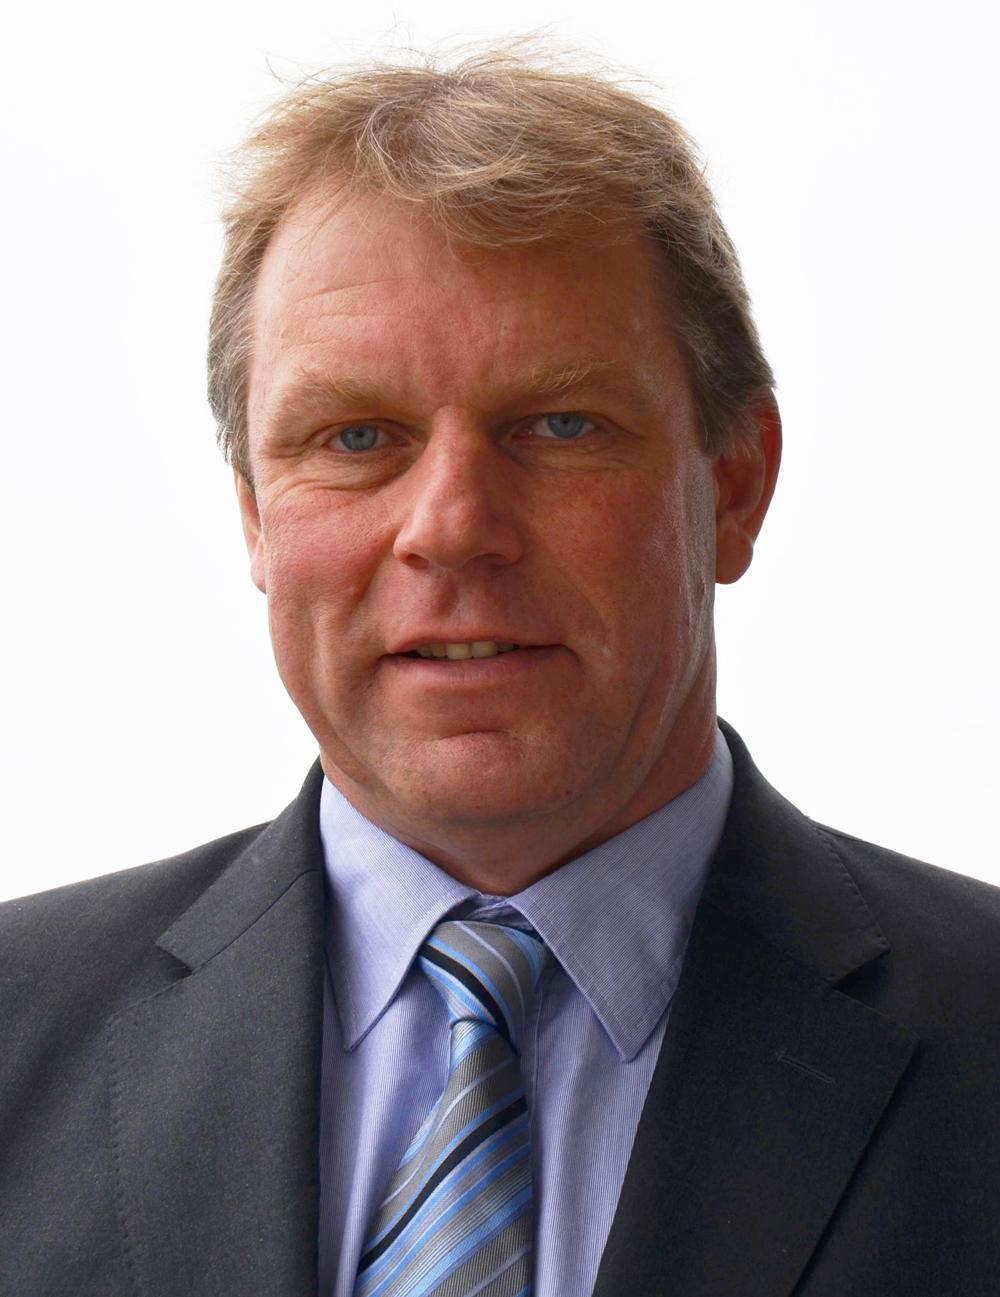 Professor Lutz Kipp ist neuer Präsident der Uni Kiel. Der 50-Jährige tritt sein Amt offiziell am 1. Juni 2014 an. Archivfoto/Copyright: privat